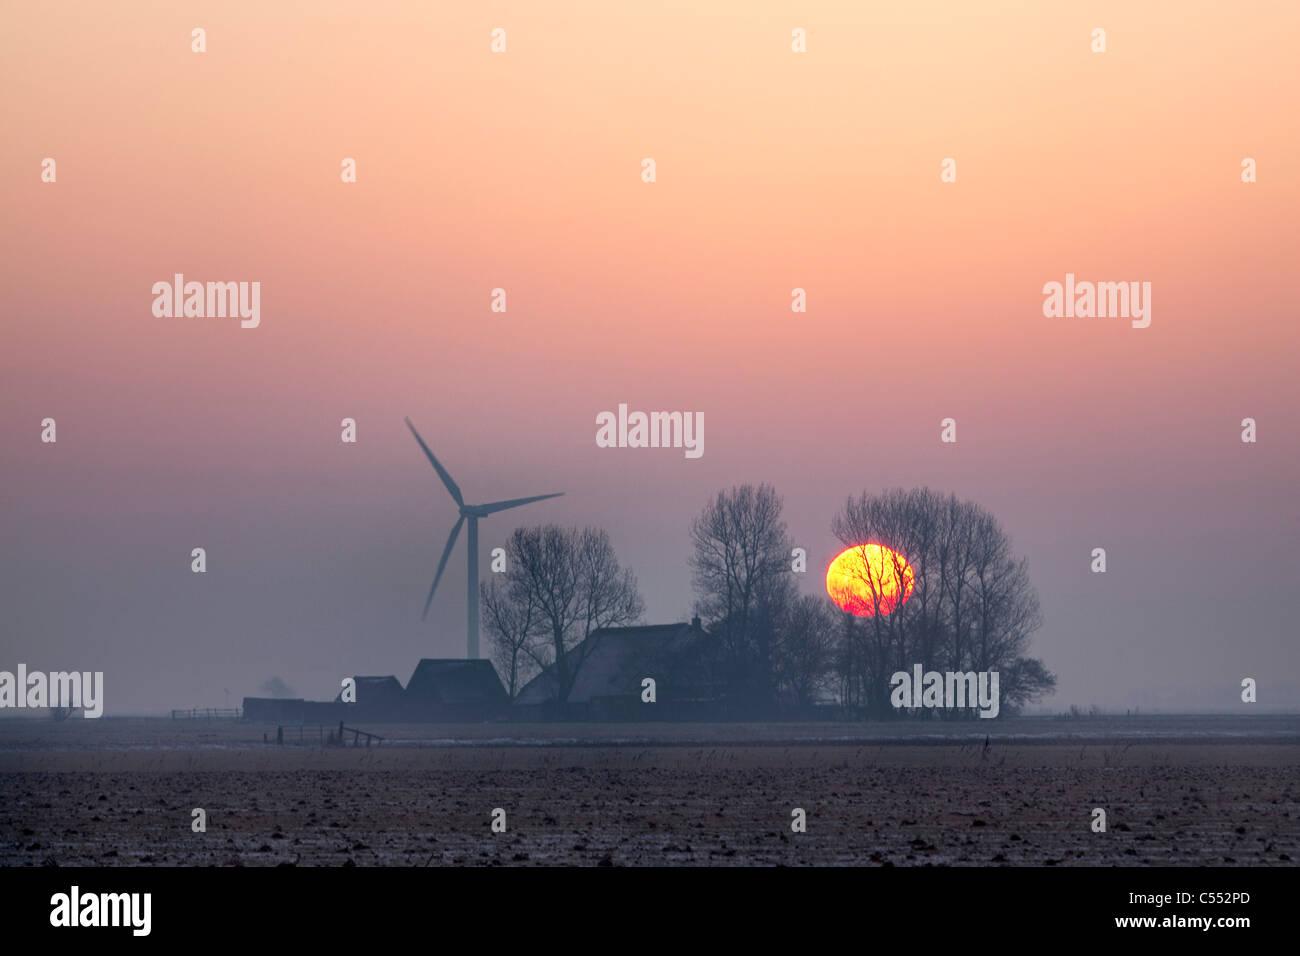 The Netherlands, Hijum, farm, wind turbine, sunrise. - Stock Image